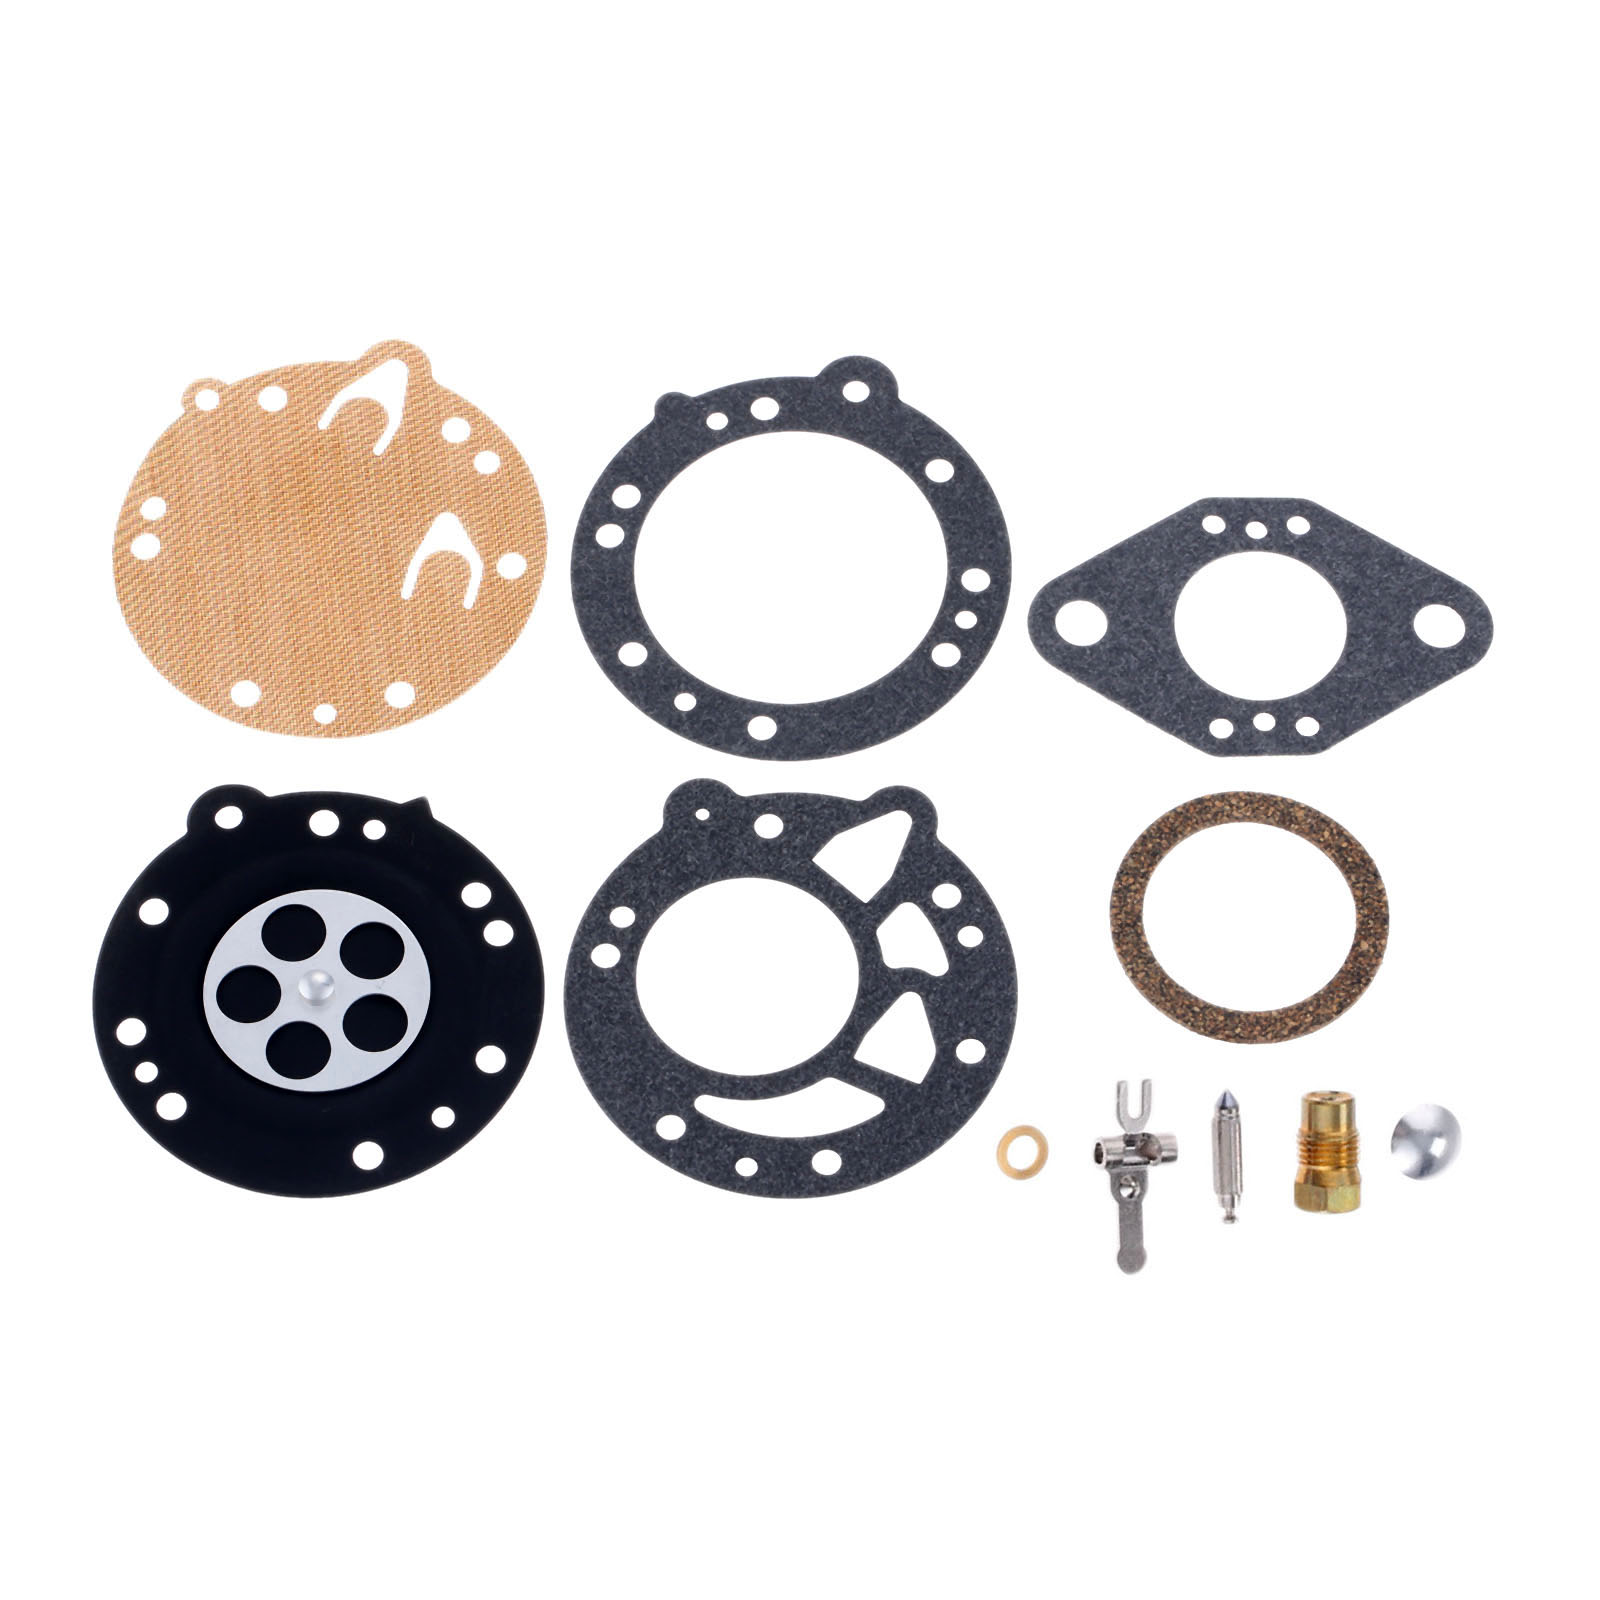 DRELD RK-88HL Carburetor Repair Kit For Tillotson RK-88HL HL Homelite WIZ ZIP Stihl/ Ryobi Carbs TRIMMER CHAINSAWS PARTS